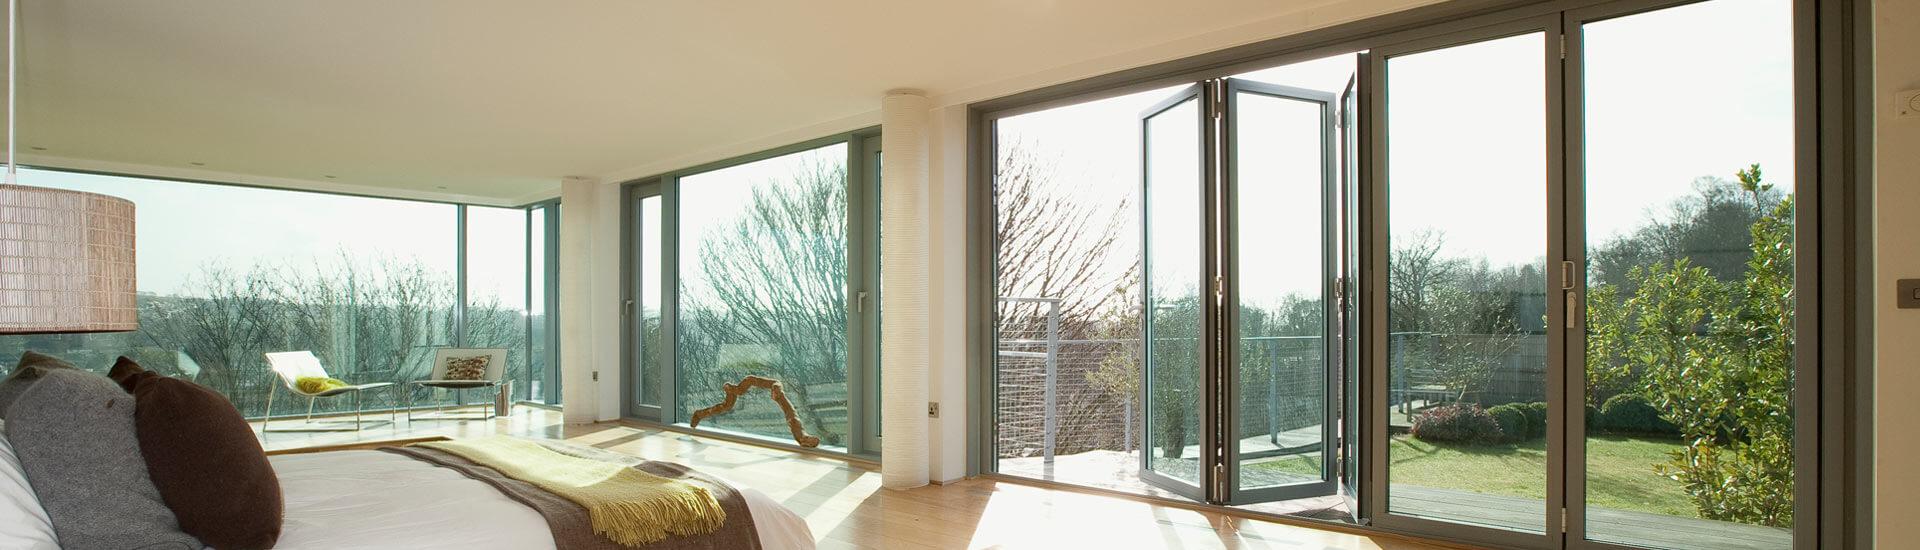 Aluminium Bi Fold Doors Brighten Your Home Today Seh Bac